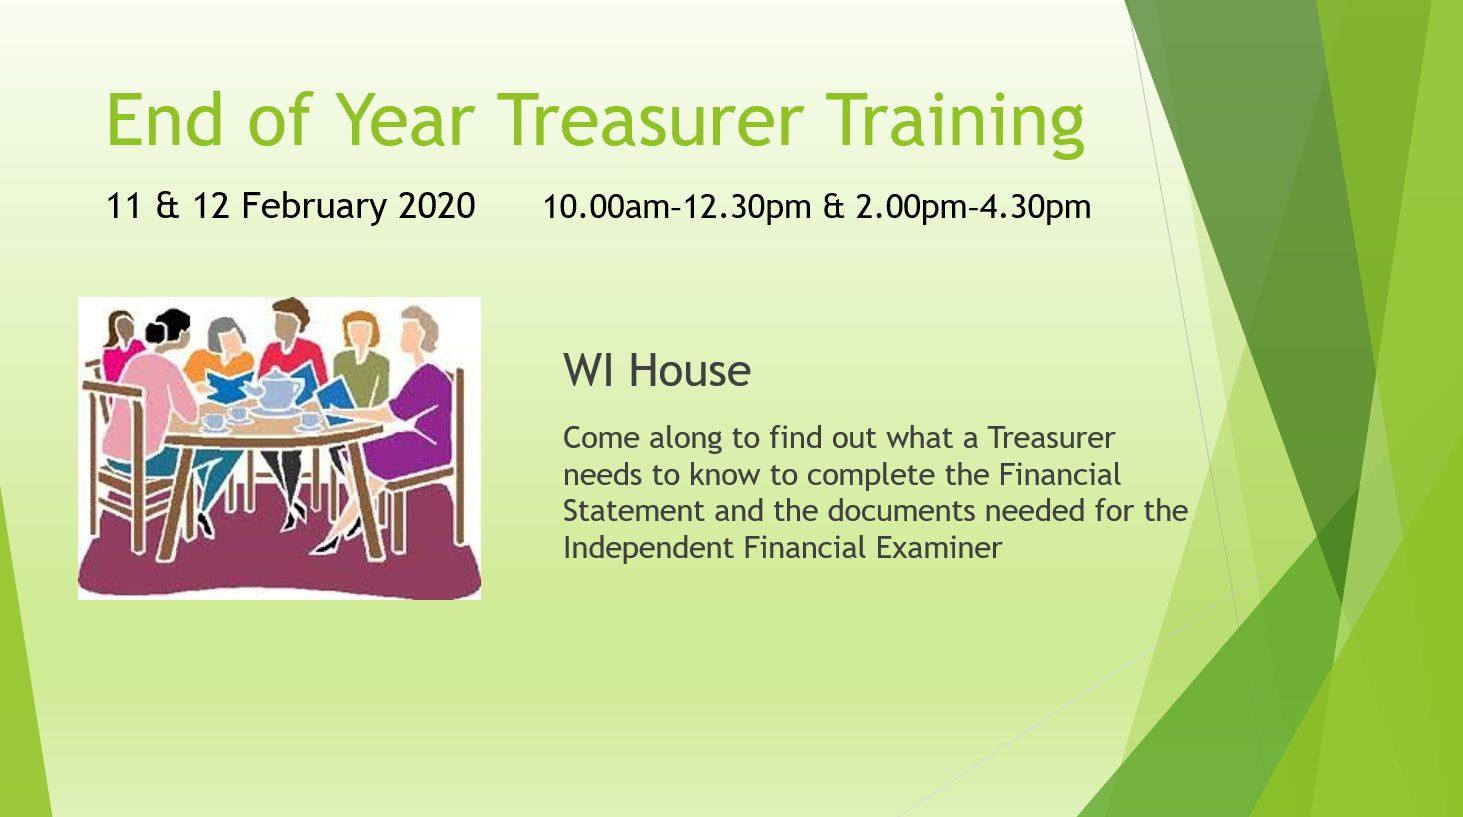 End of Year Treasurer Training